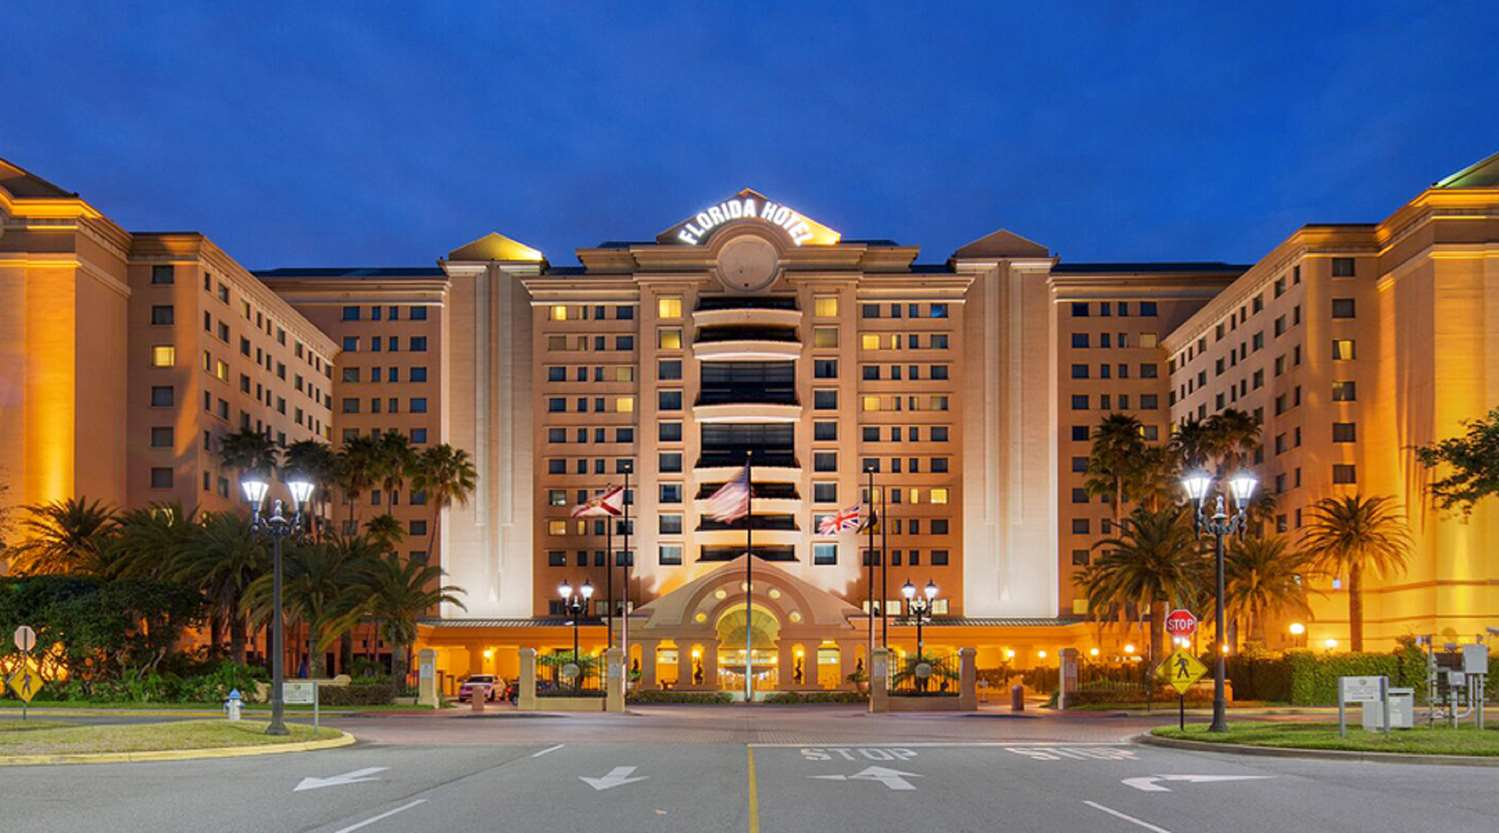 Exterior view - Florida Hotel & Conference Center Orlando